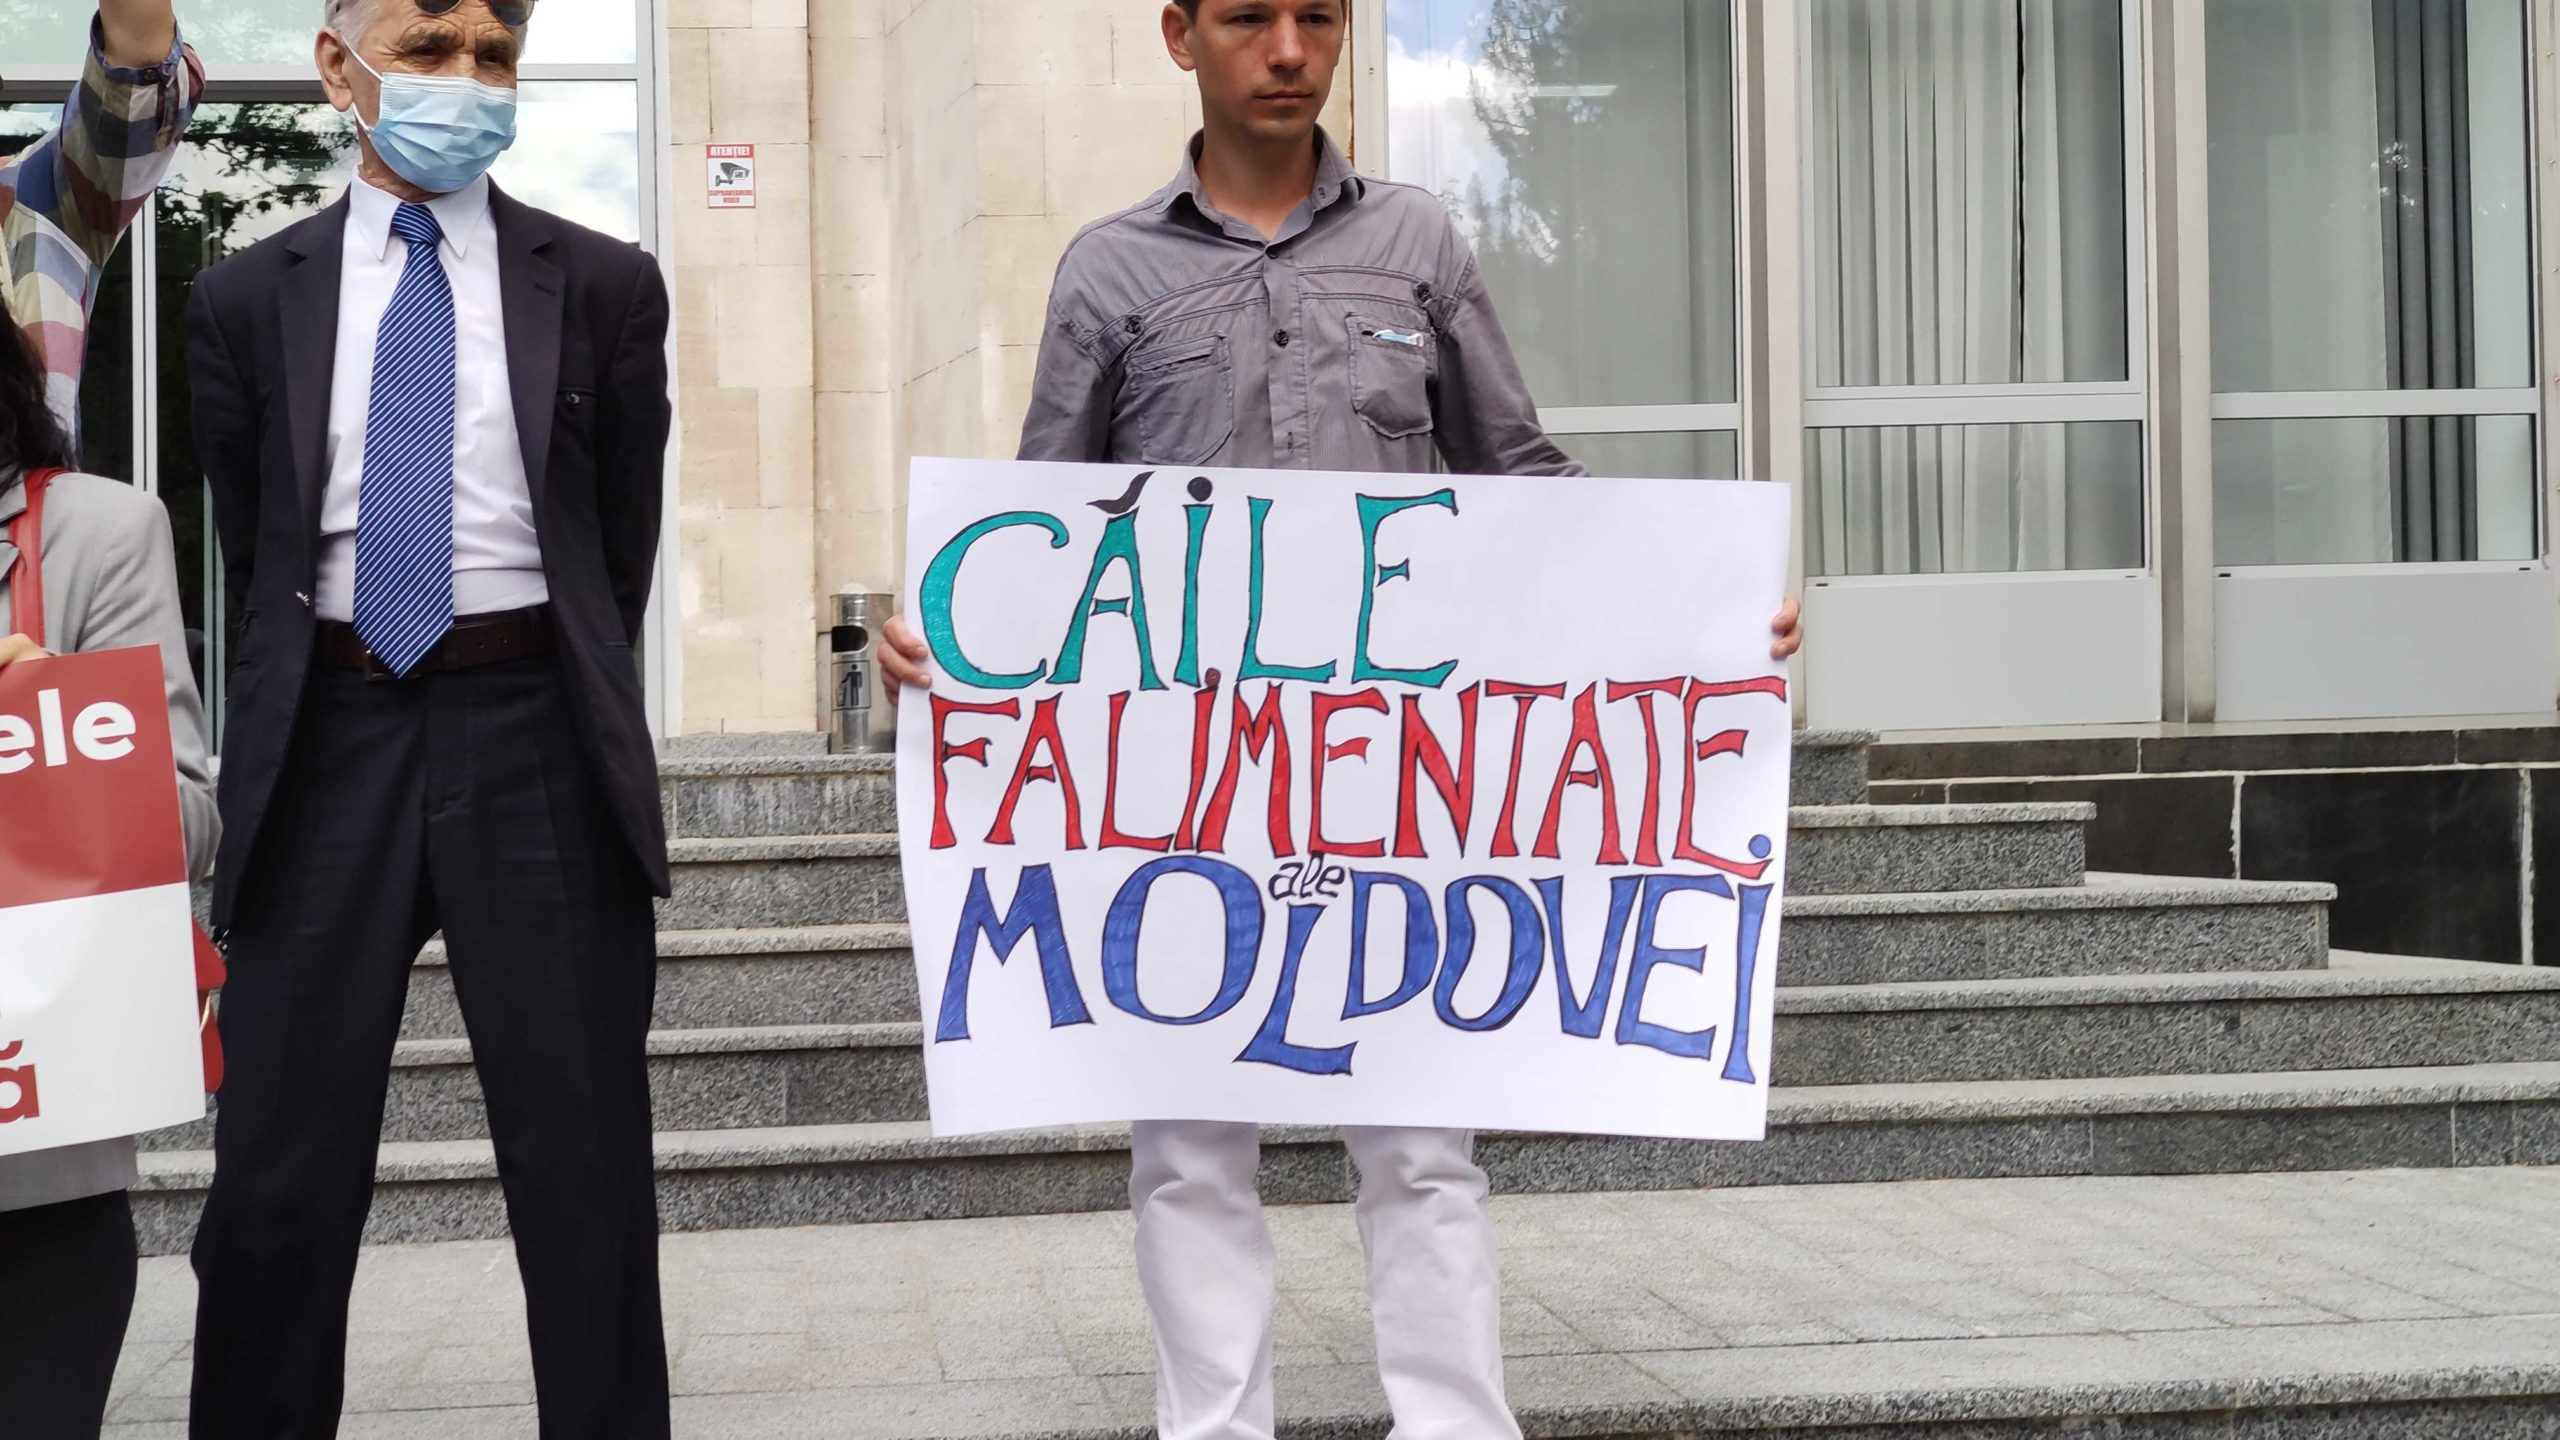 Представители DAпротестуют против «беззакония» наЖДМ. Стрим NM